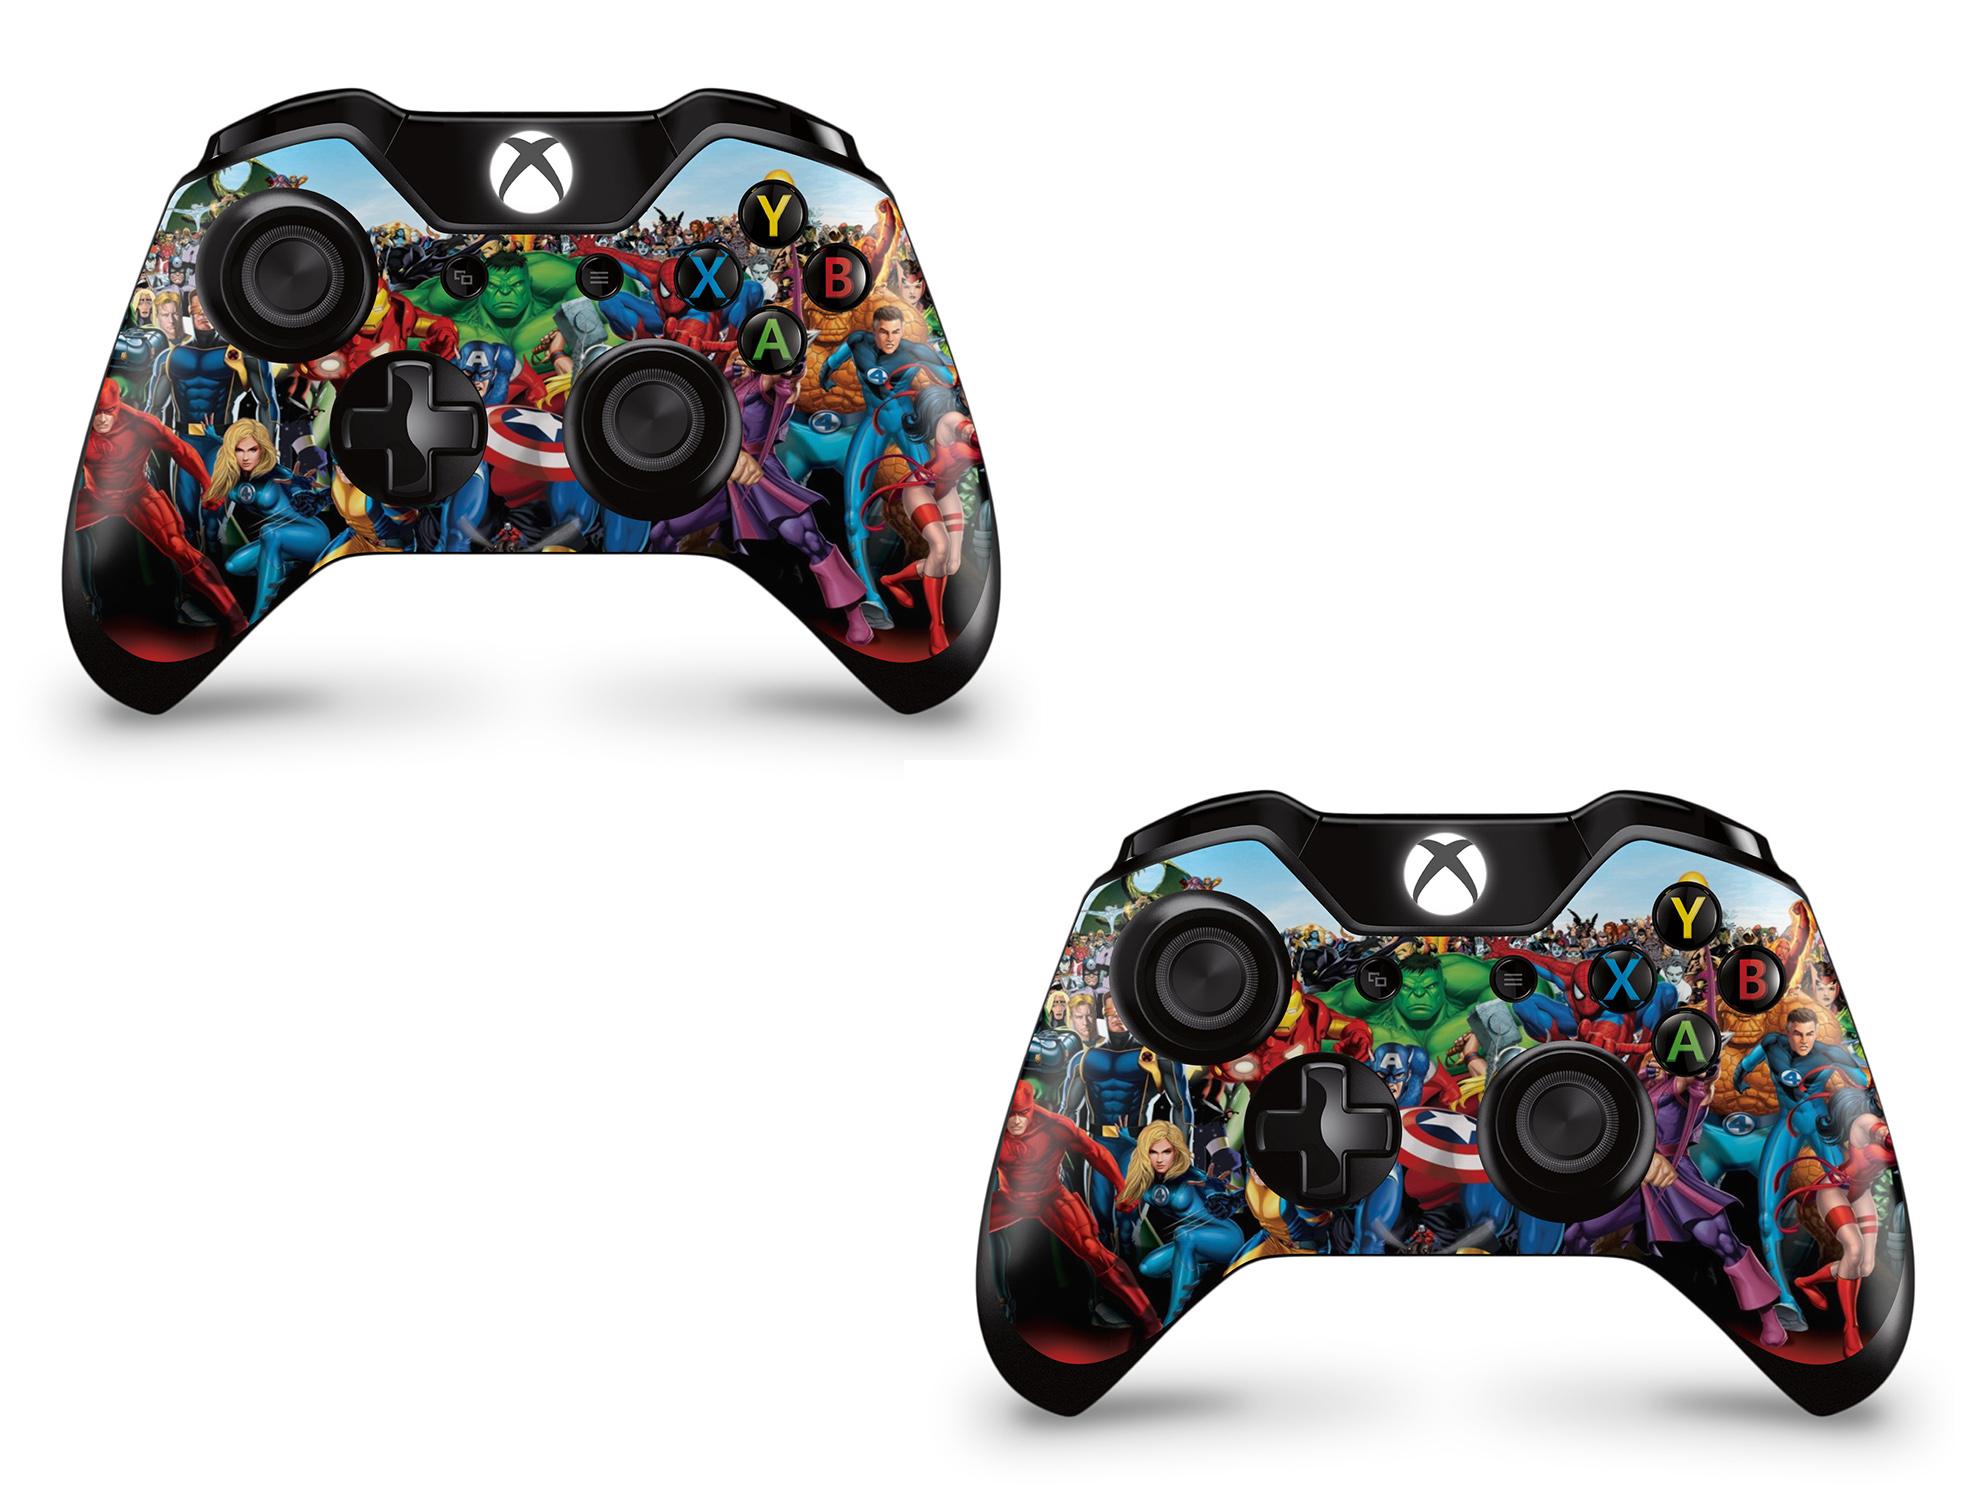 GNG 2 x Xbox One Controller Skins Full Wrap Vinyl Sticker ... Xbox One Skins Ebay